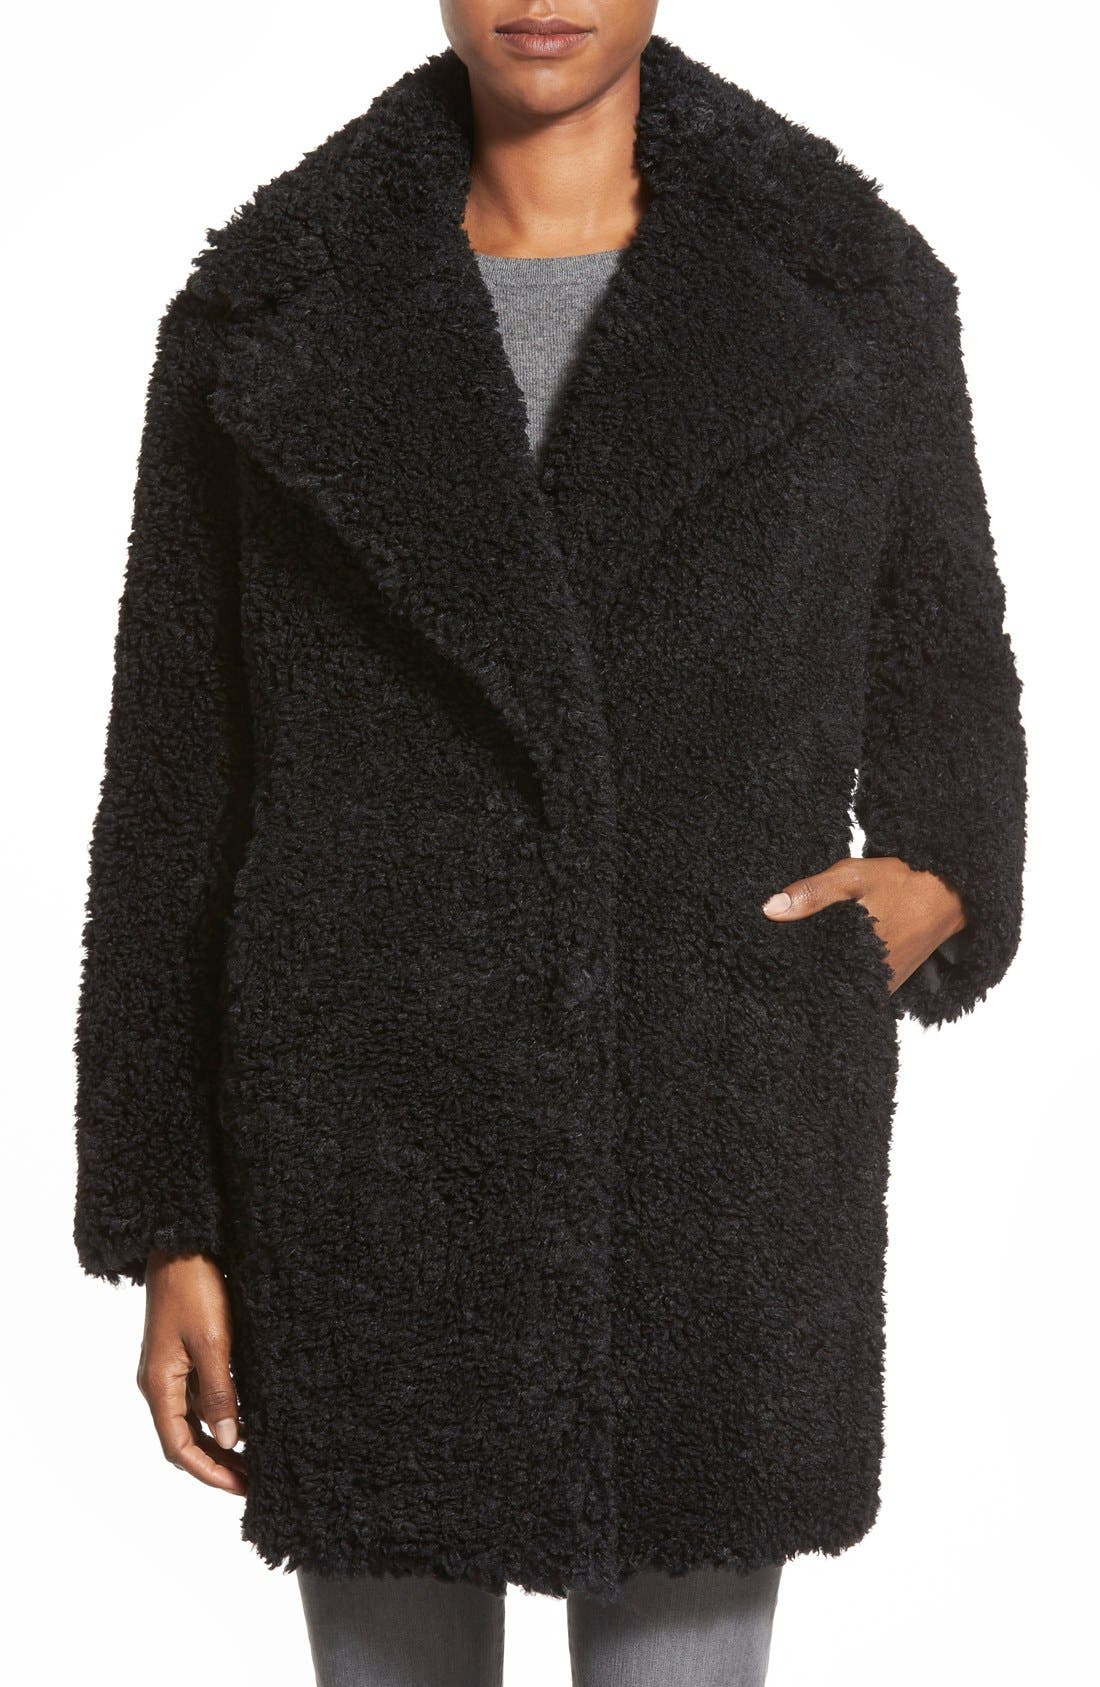 KENSIE,                             'Teddy Bear' Notch Collar Reversible Faux Fur Coat,                             Main thumbnail 1, color,                             001